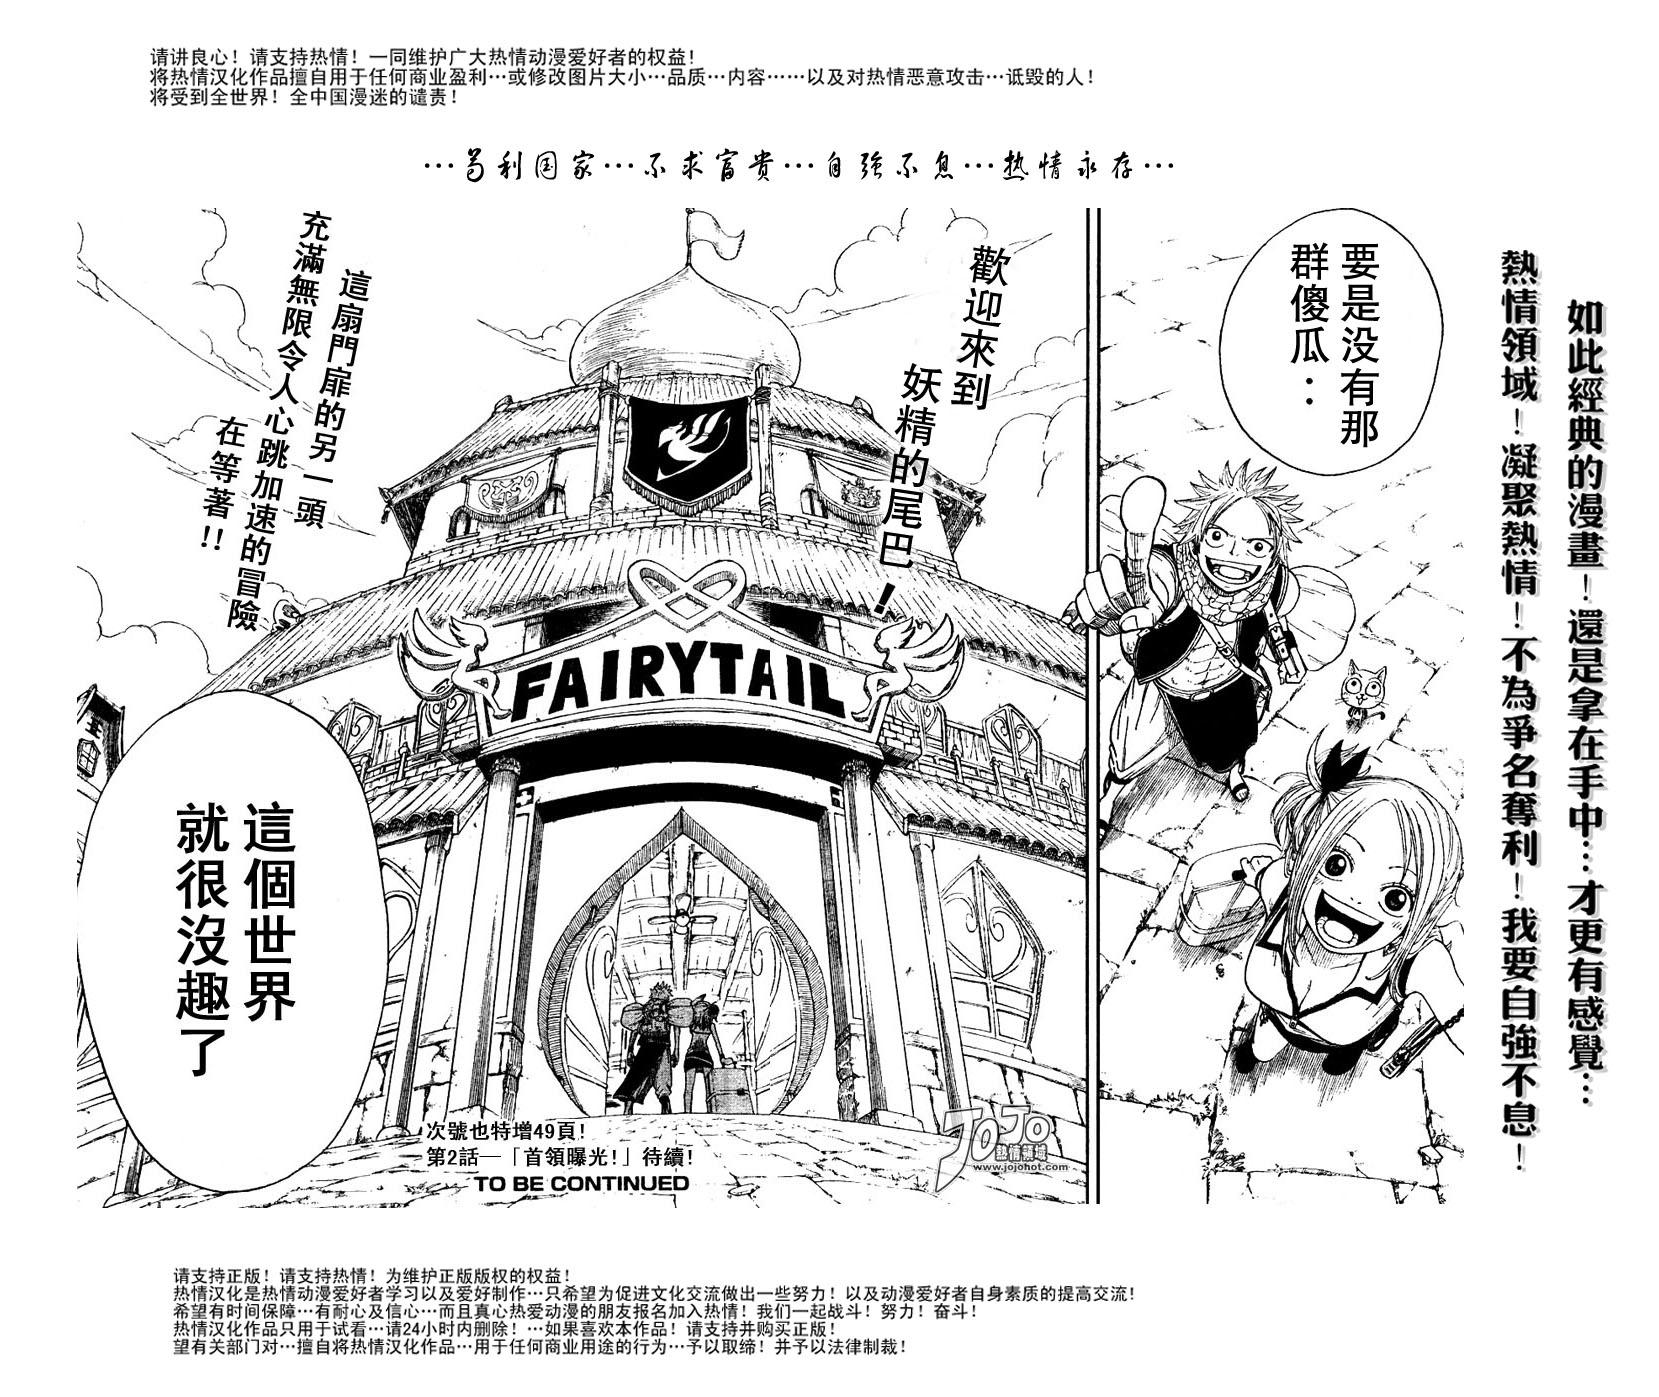 fairytail_1_73